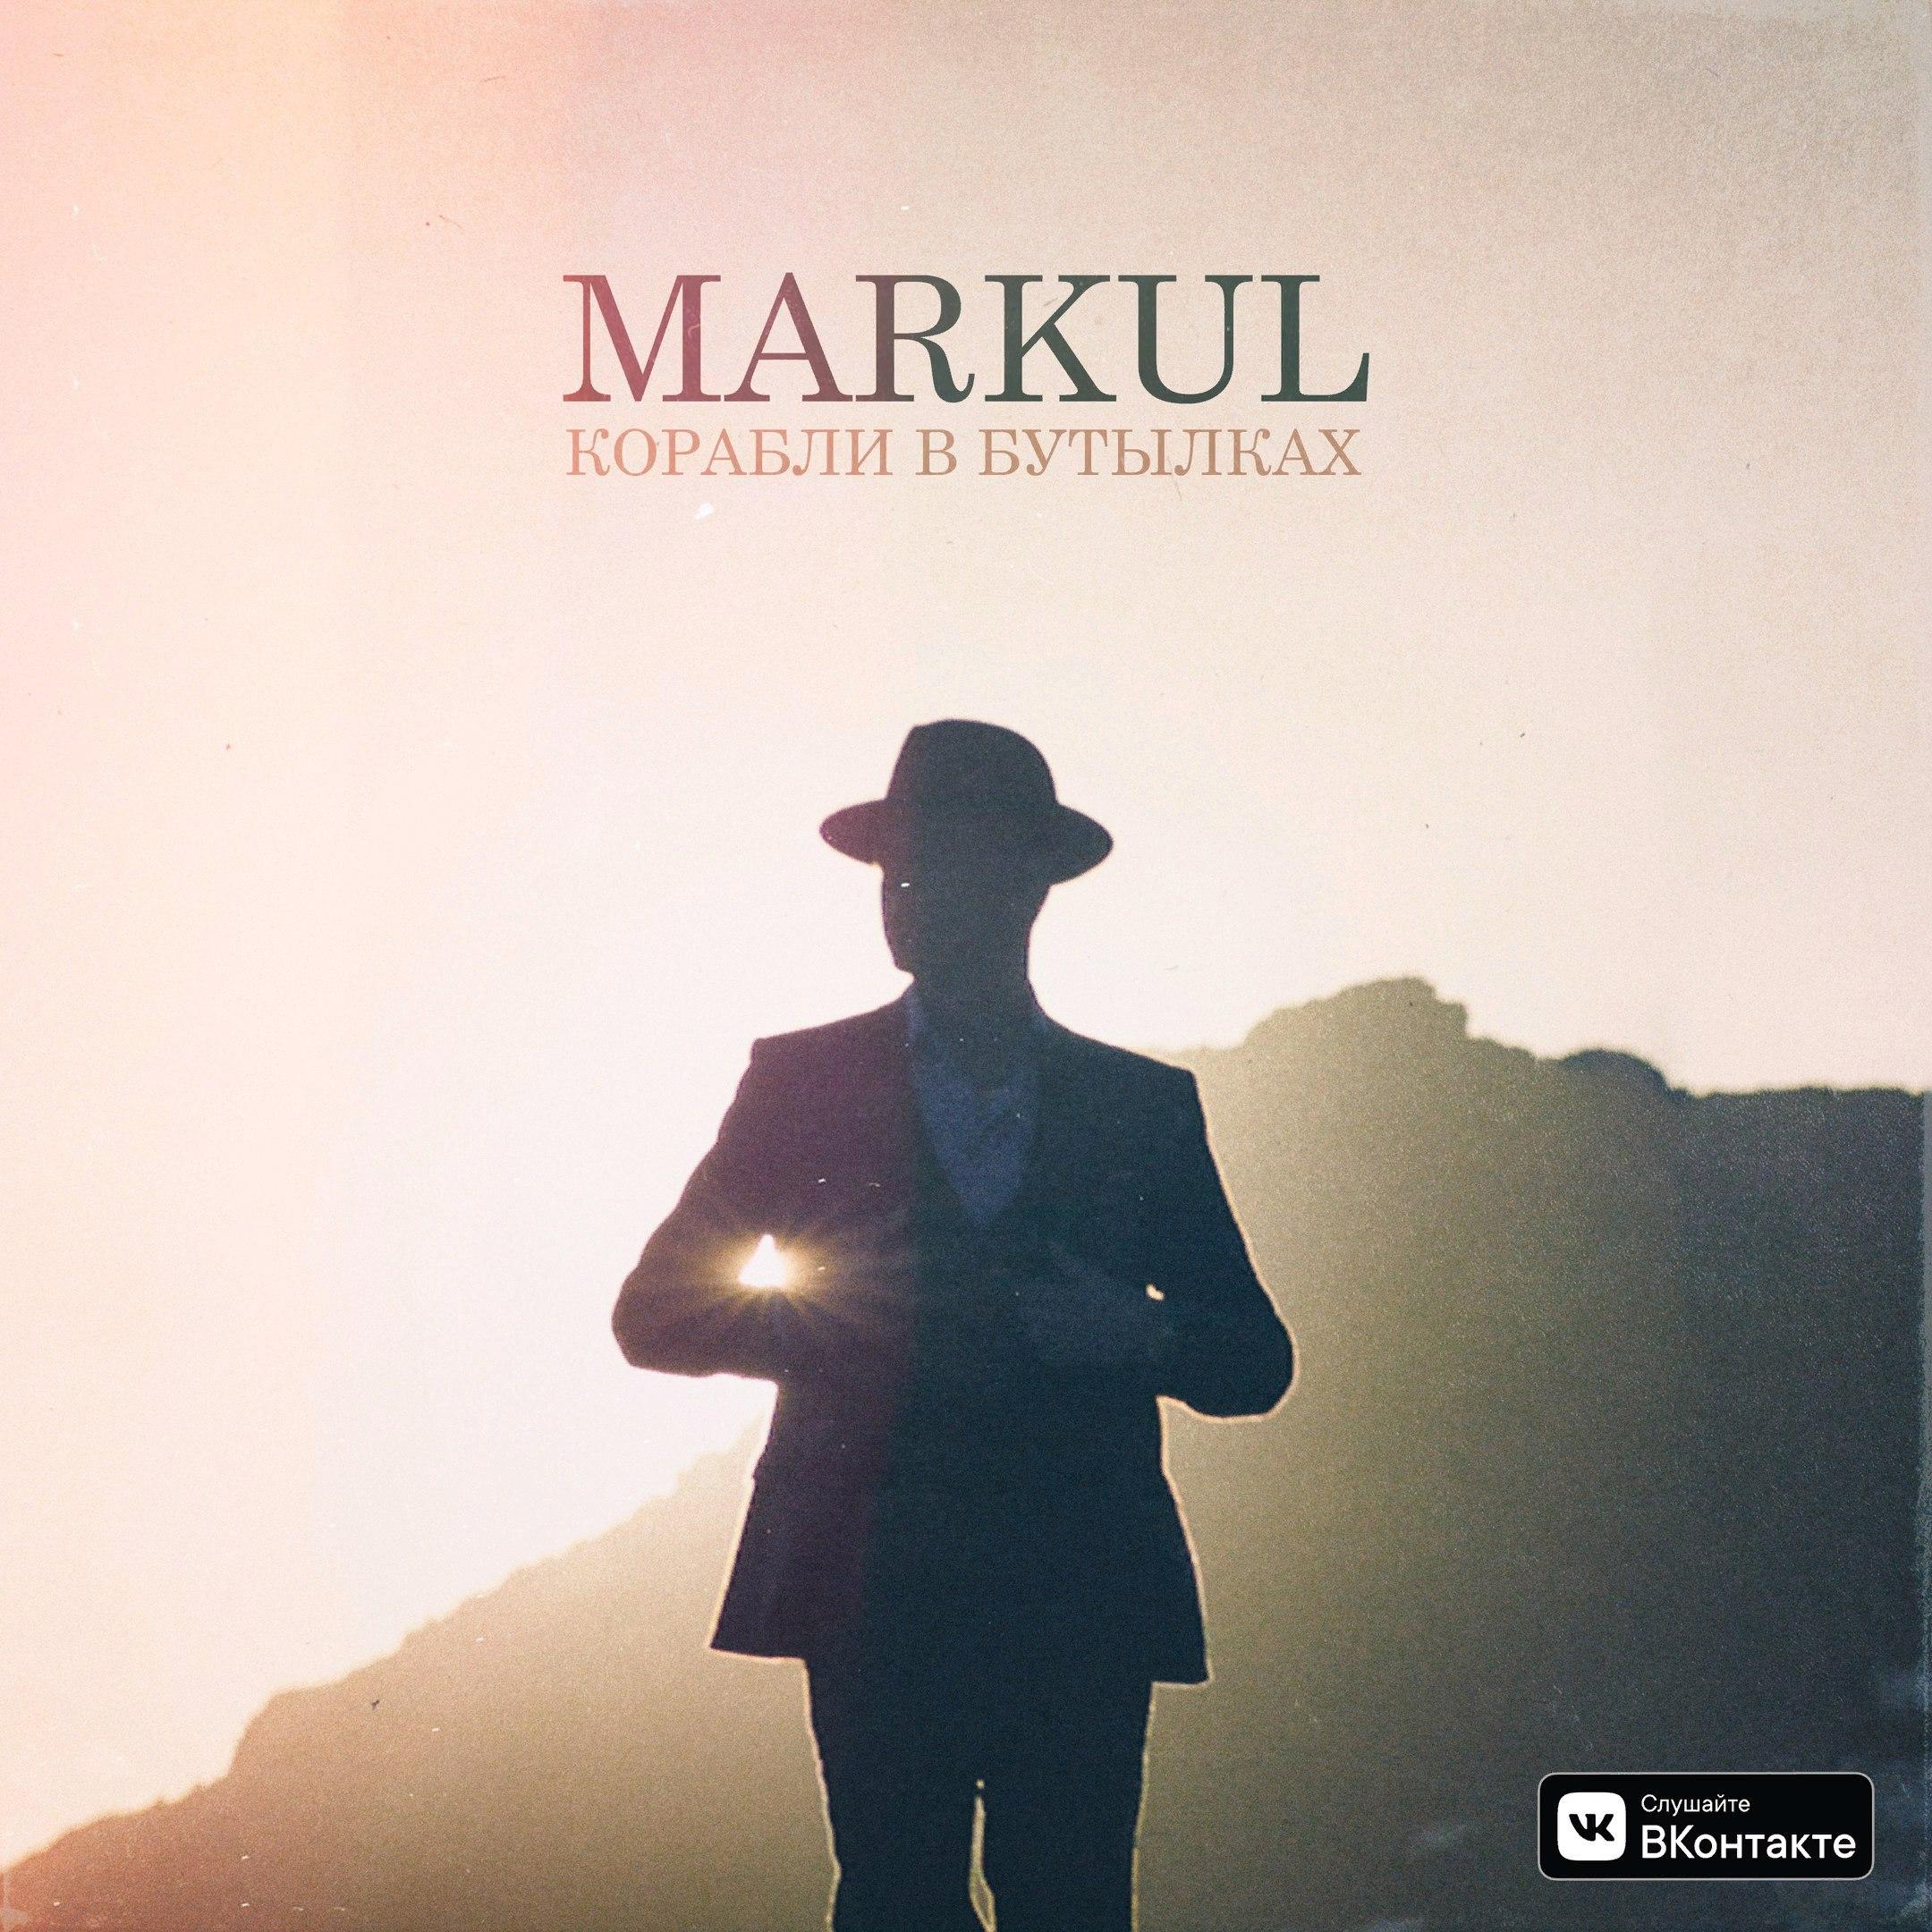 Markul – Корабли в бутылках